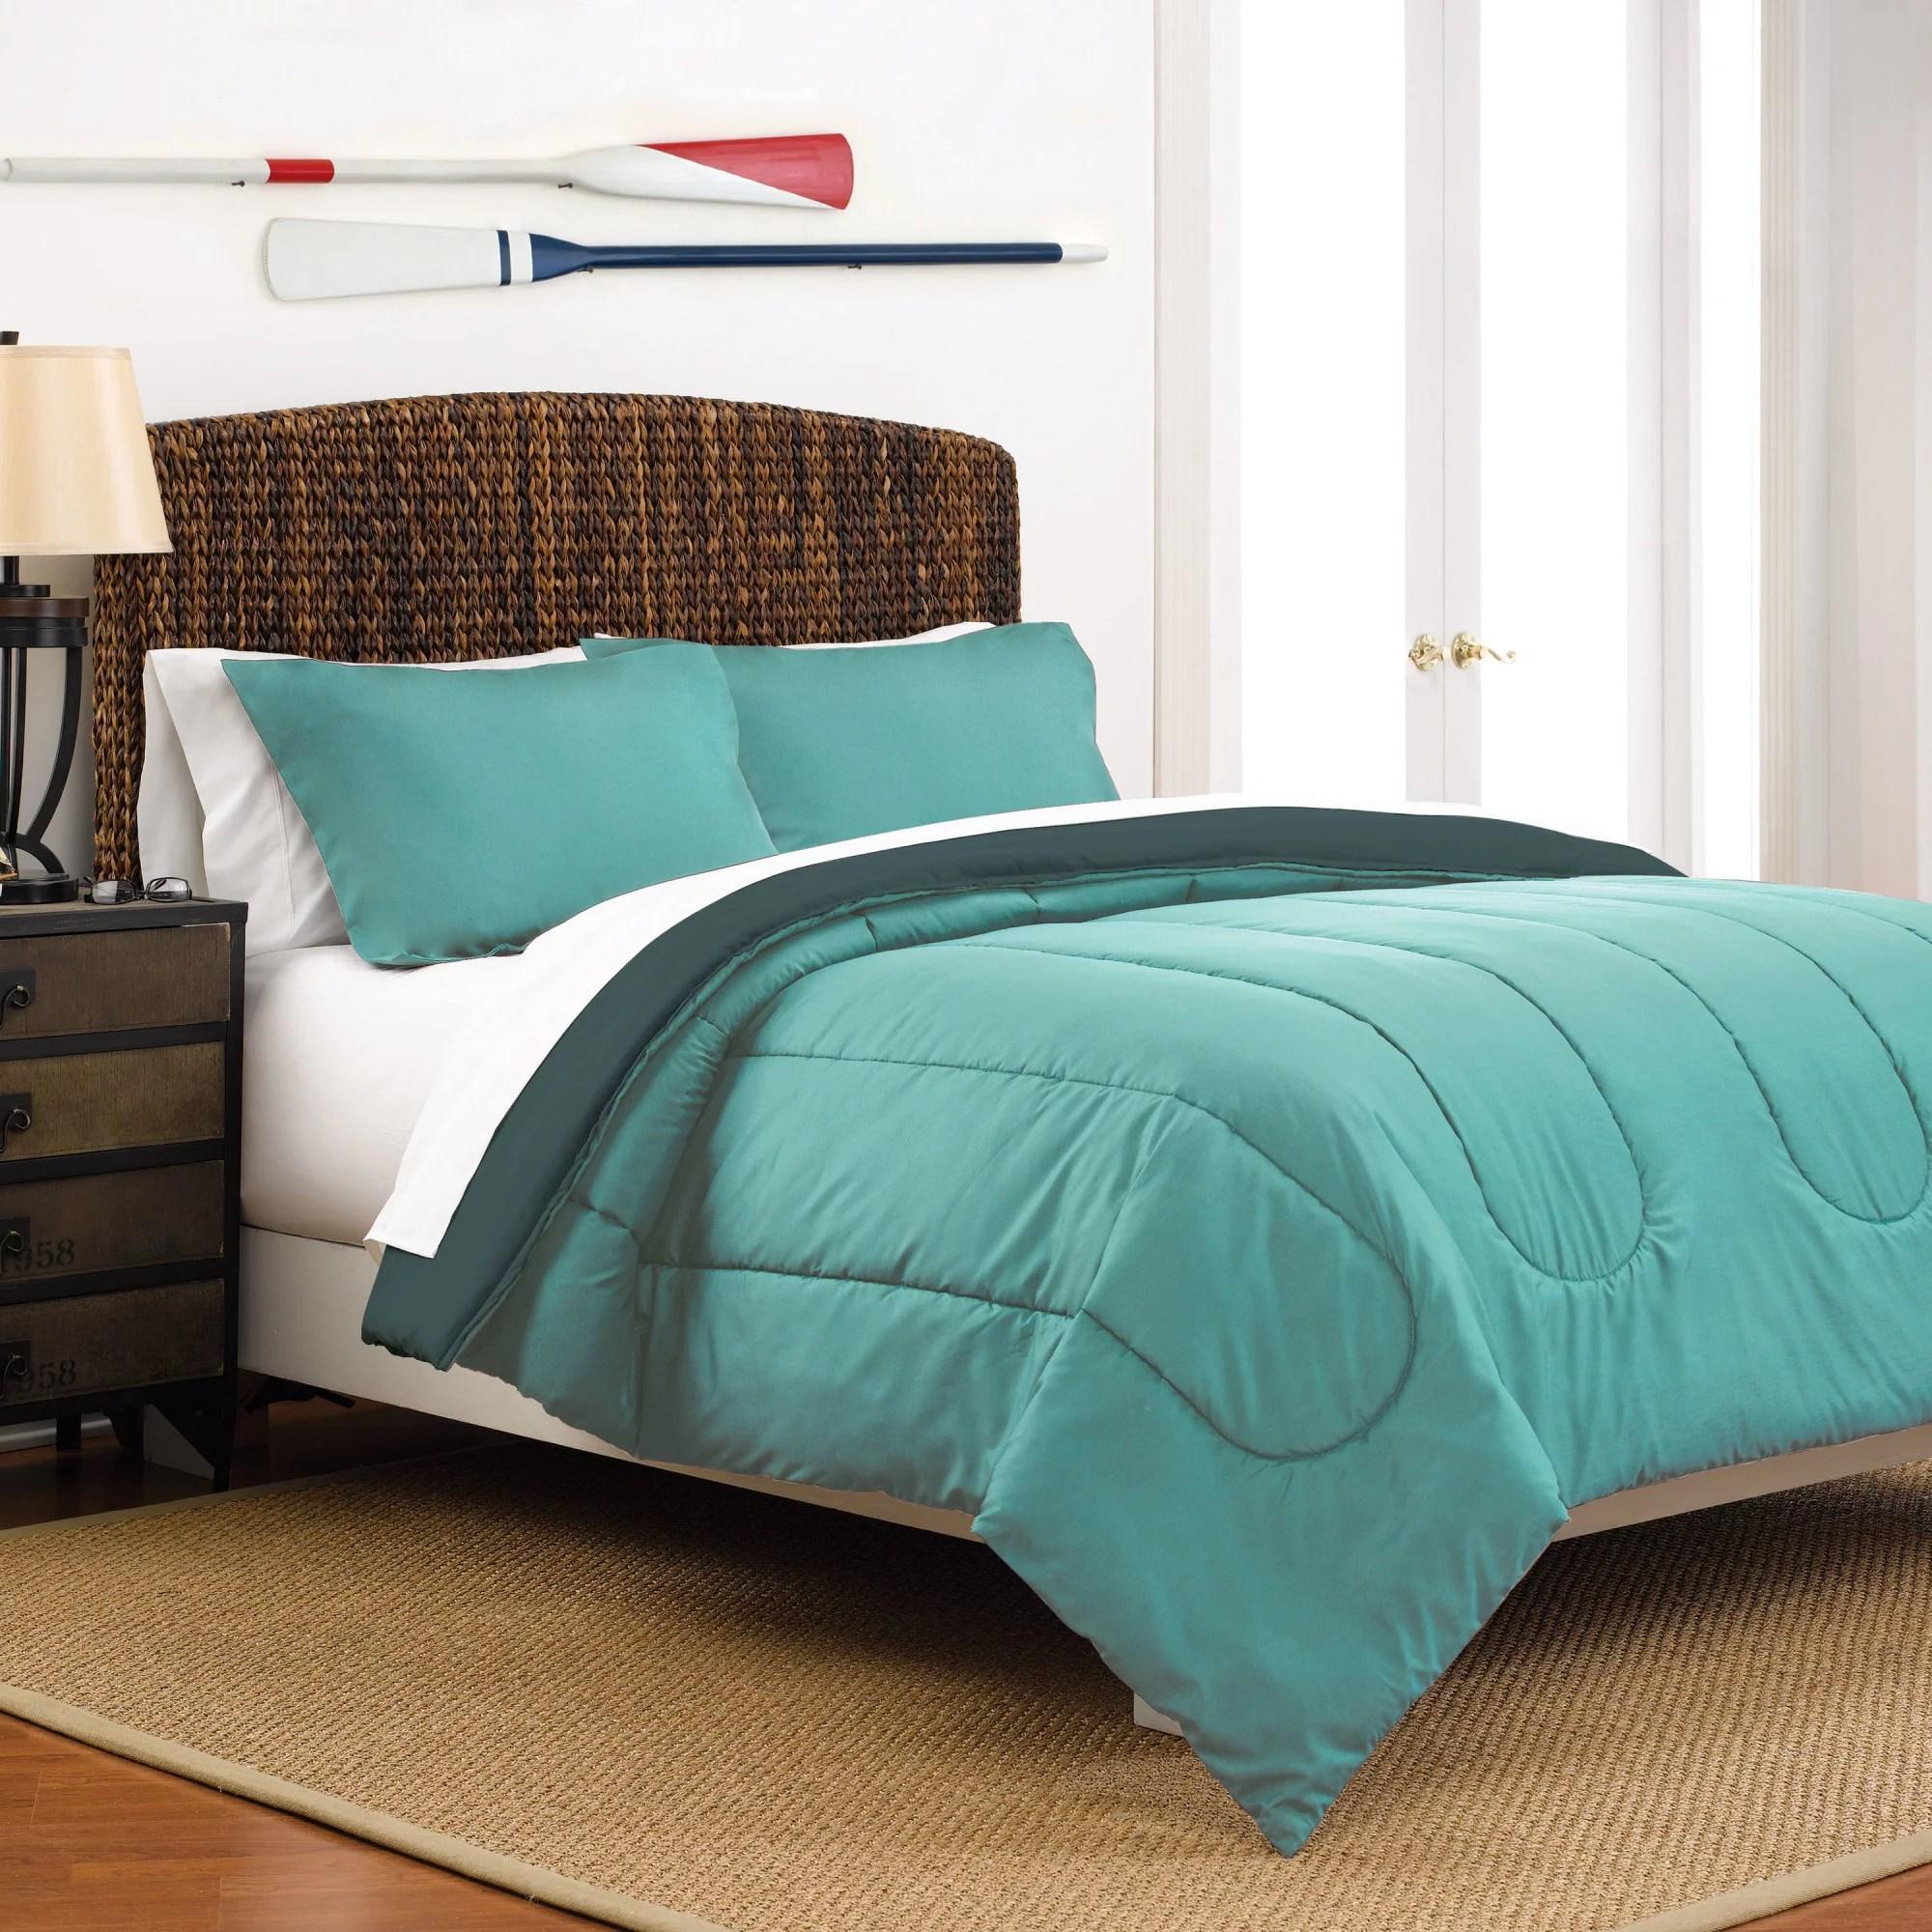 martex reversible lightweight 3 piece comforter set full queen light gray navy